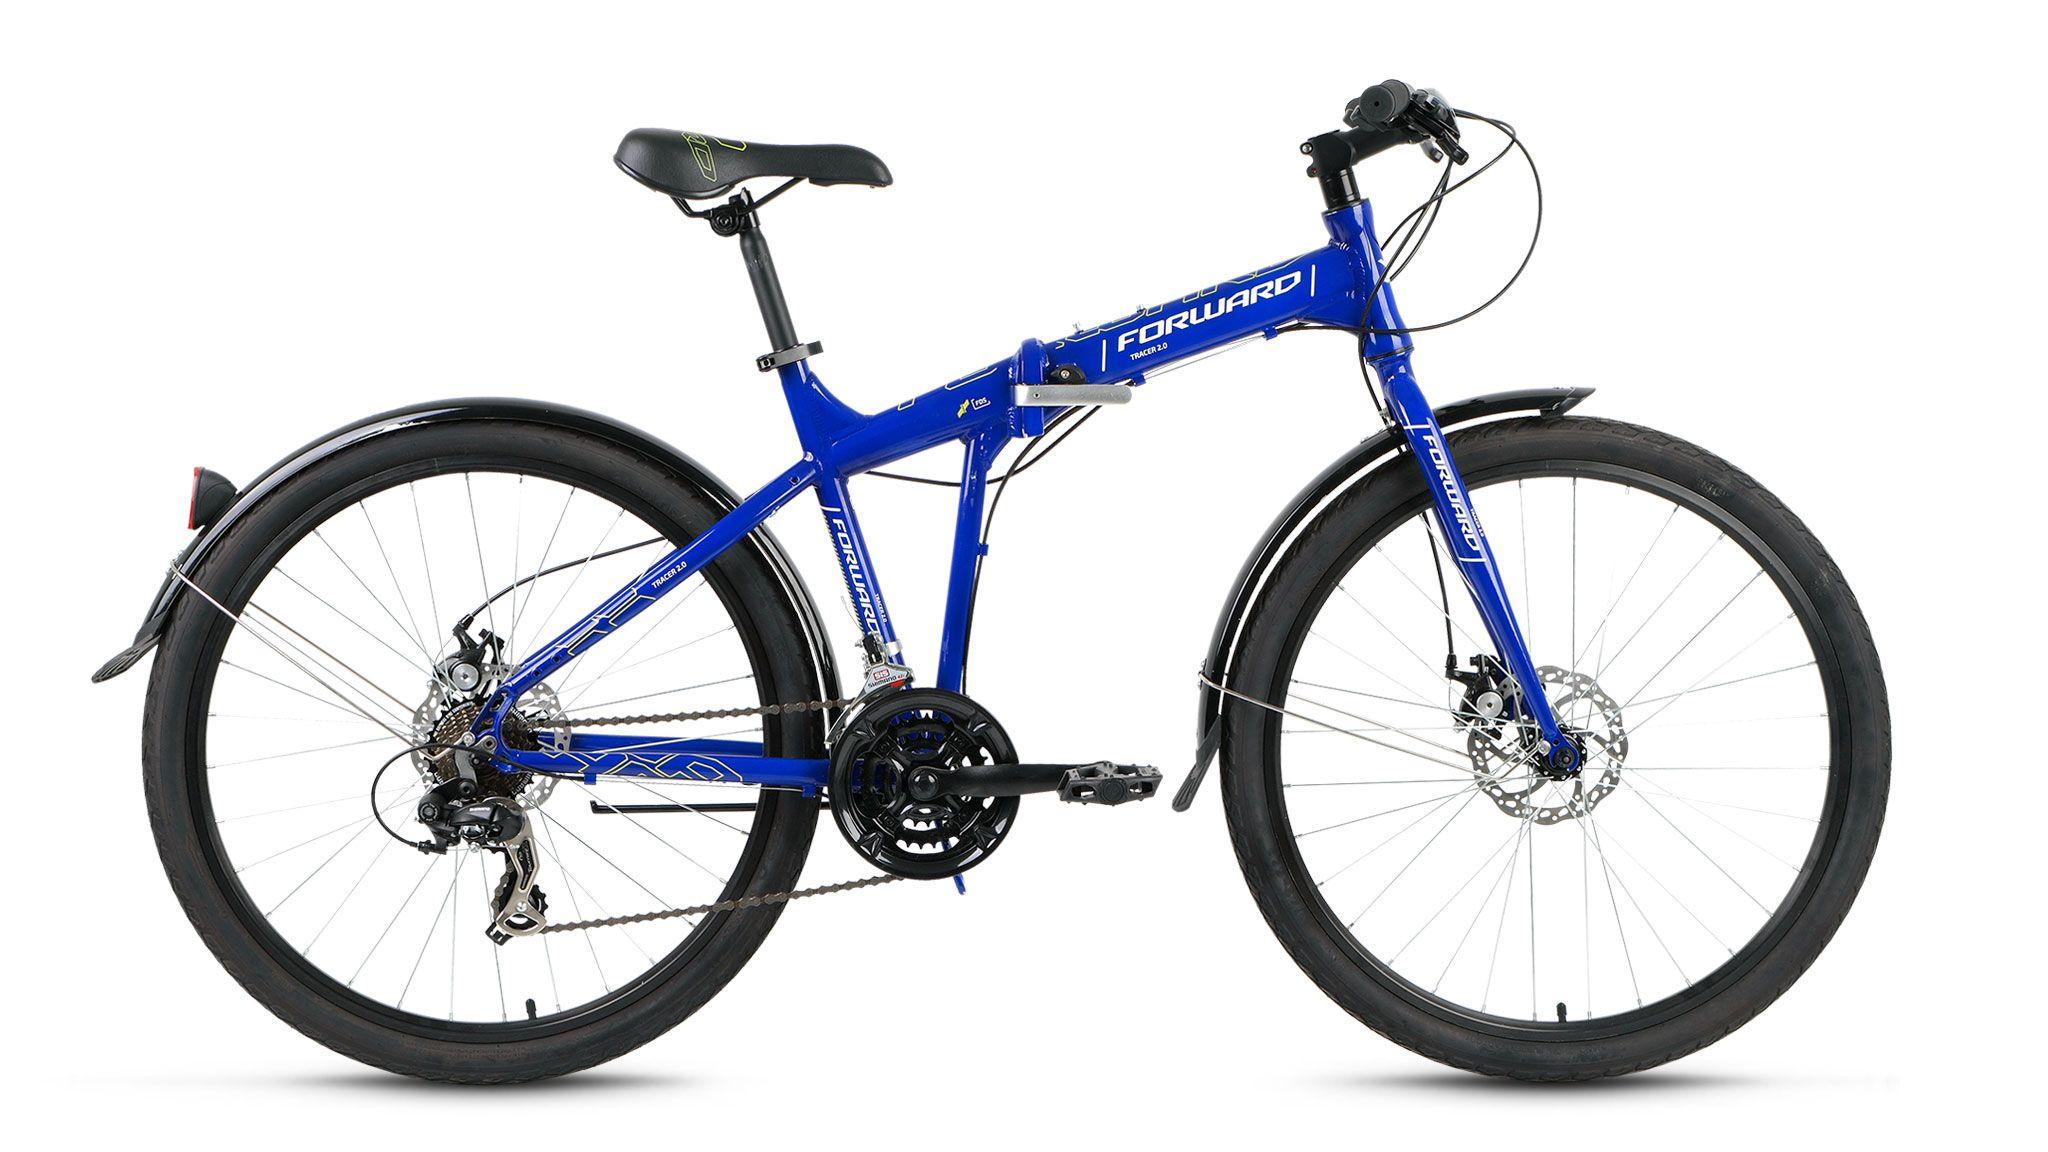 Велосипед Forward Tracer 2.0 disc 2016 велосипед forward terra 1 0 2016 18 navy white